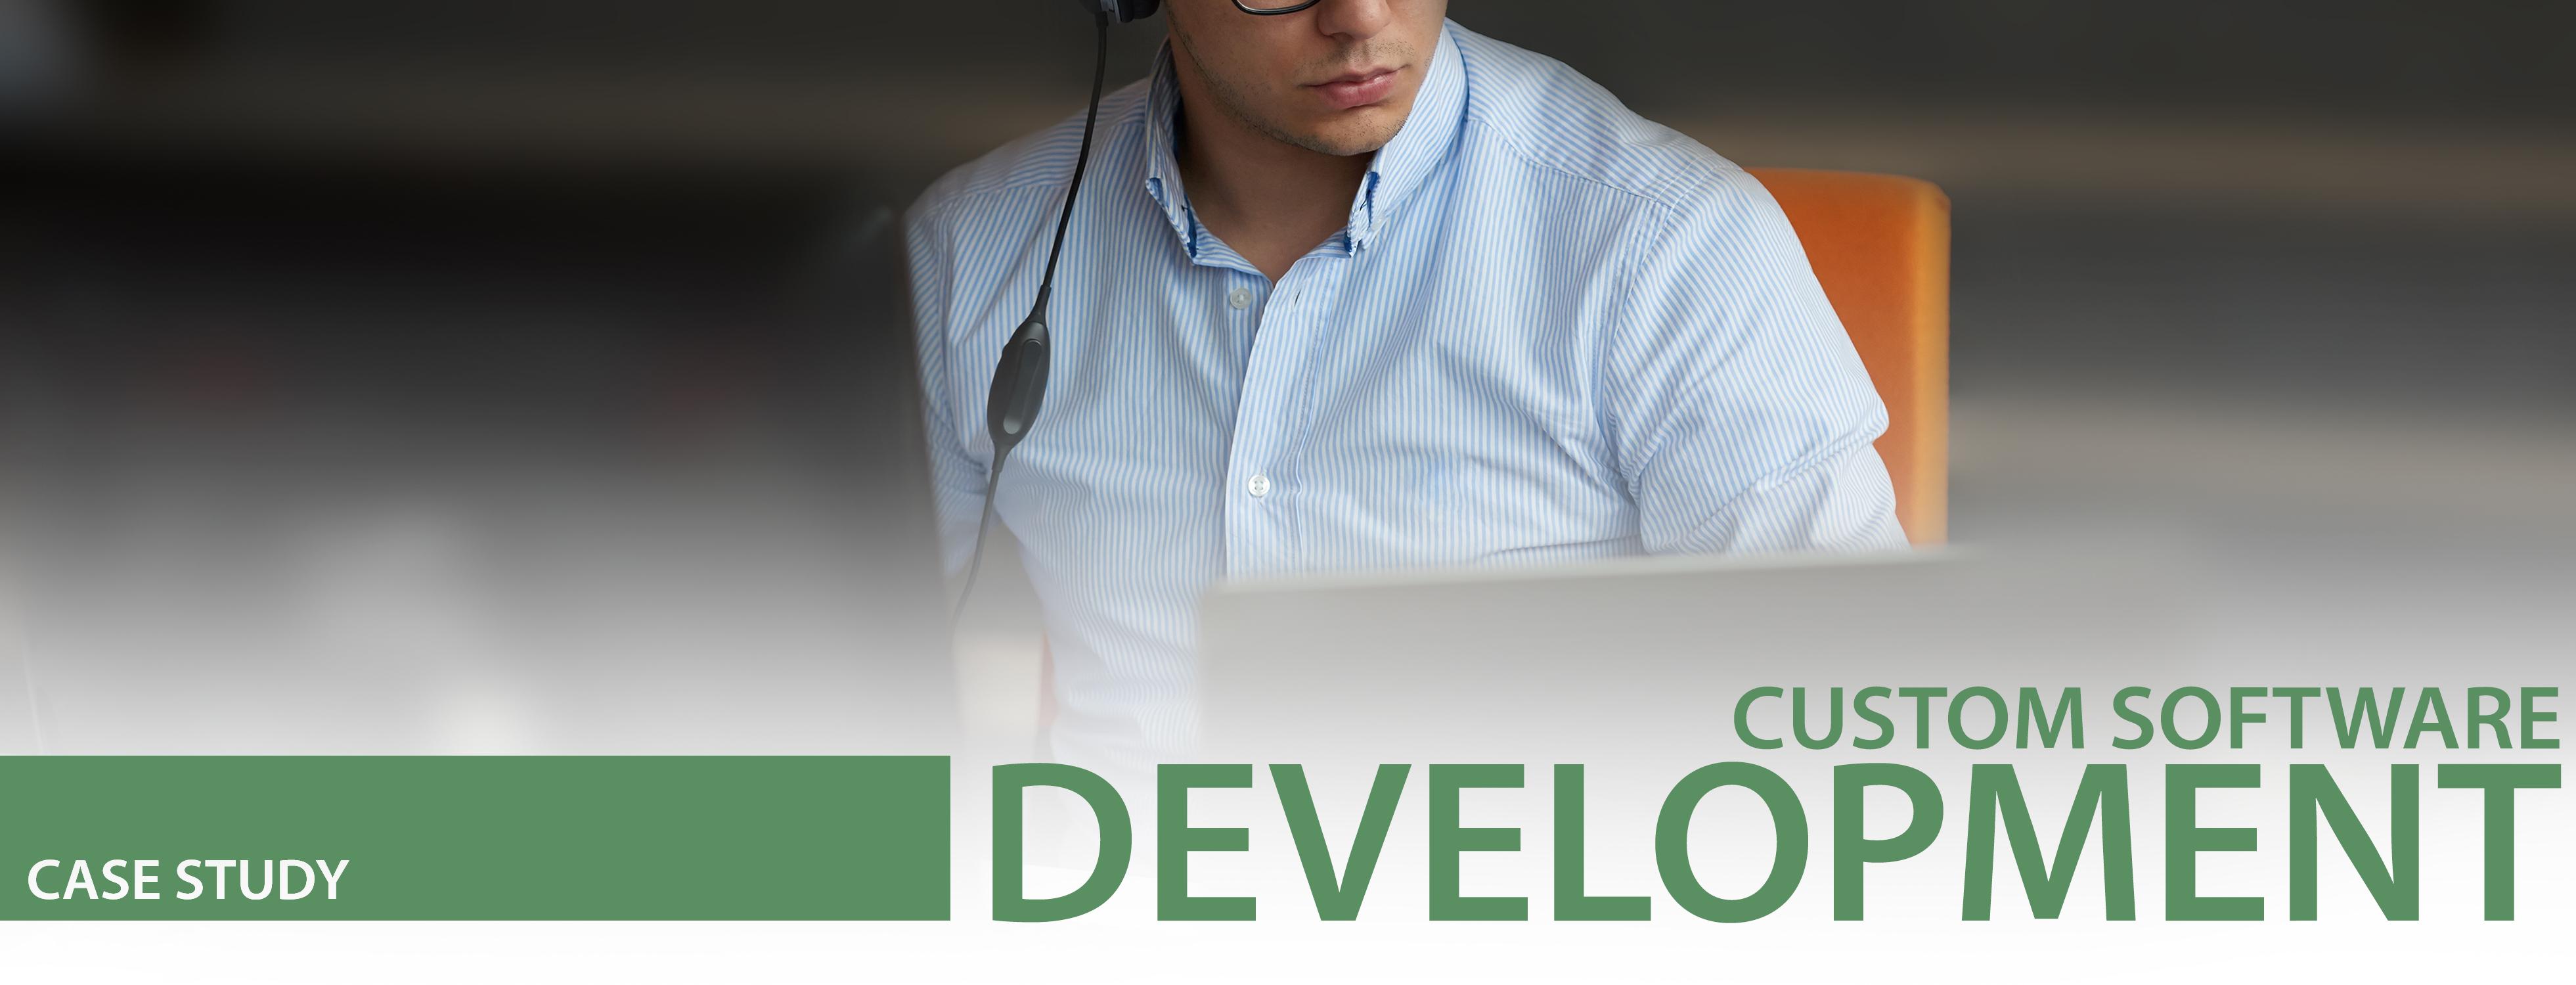 custom software development case study header